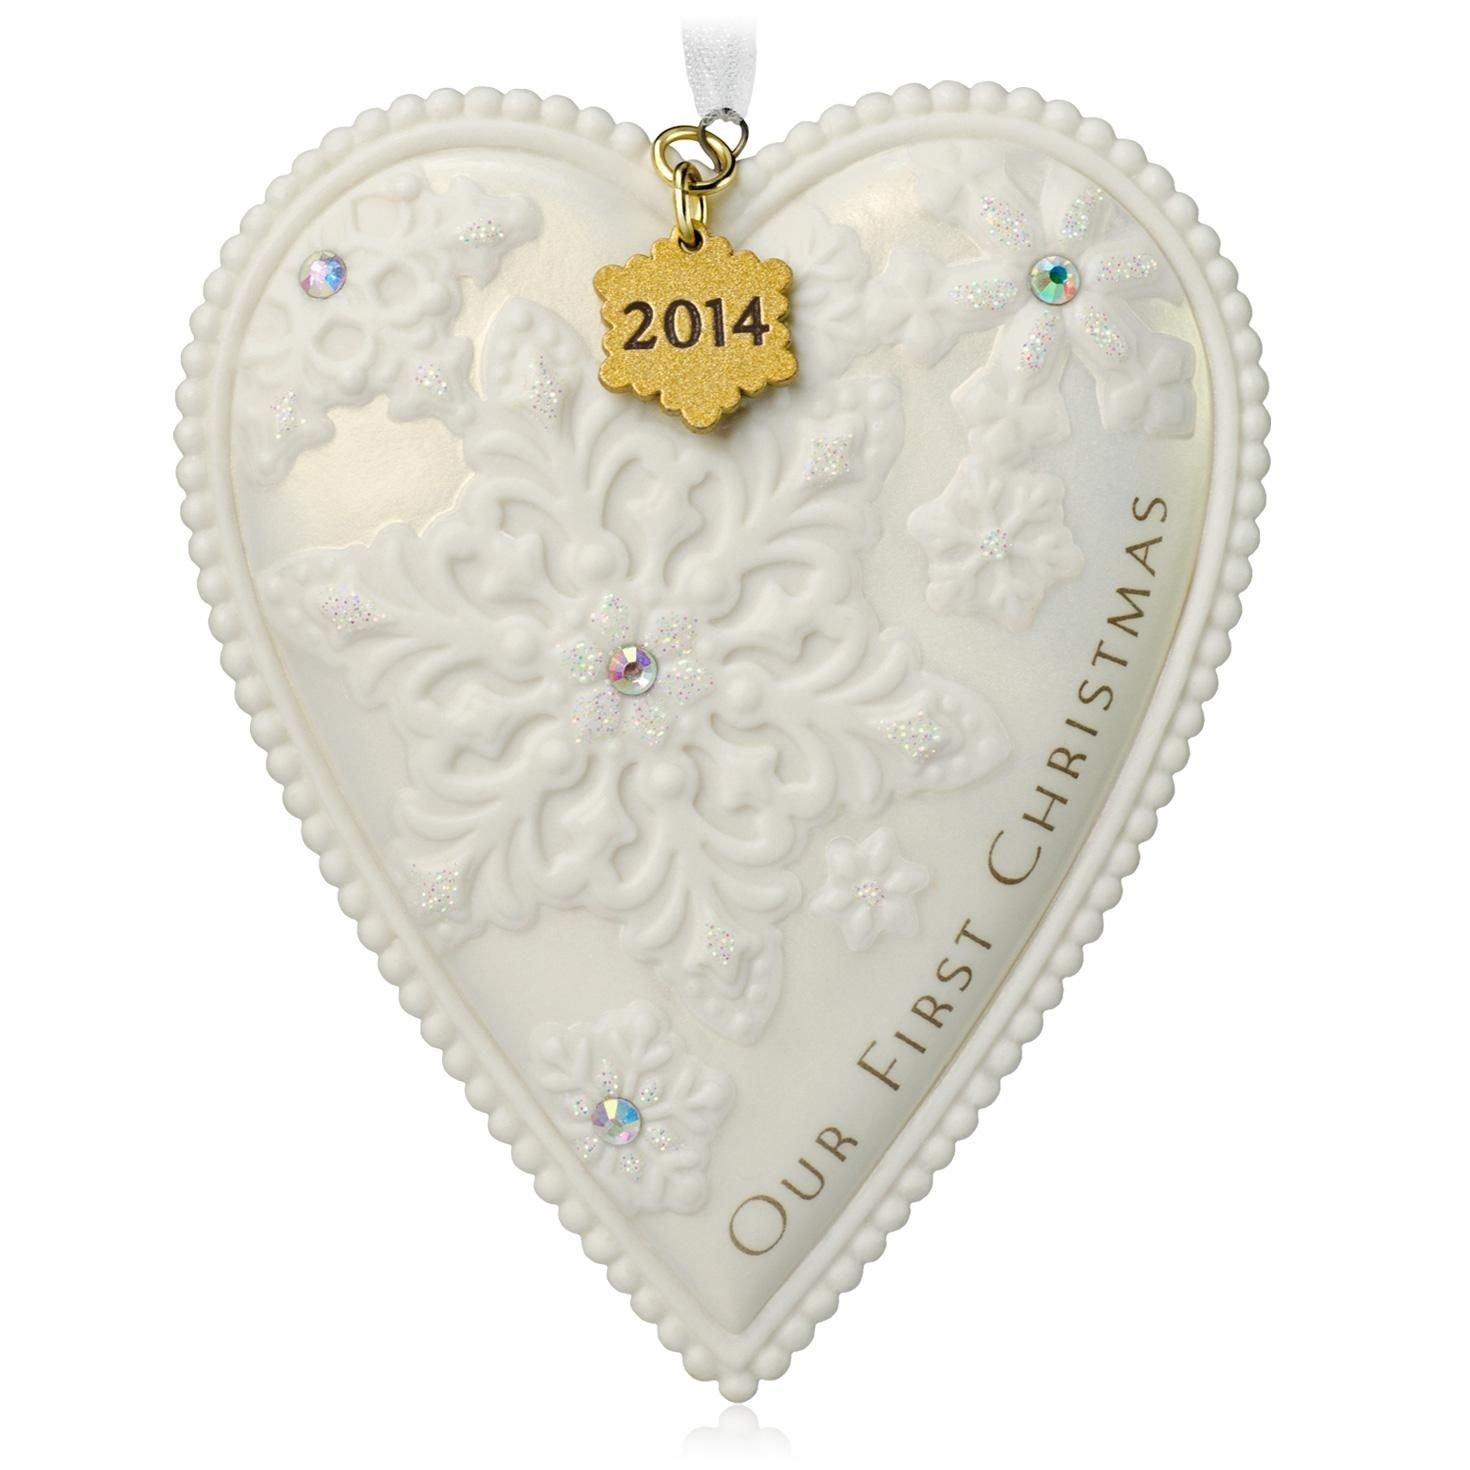 Amazon: Hallmark Qgo1156 Our First Christmas  Porcelain Heart 2014  Keepsake Ornament: Home & Kitchen